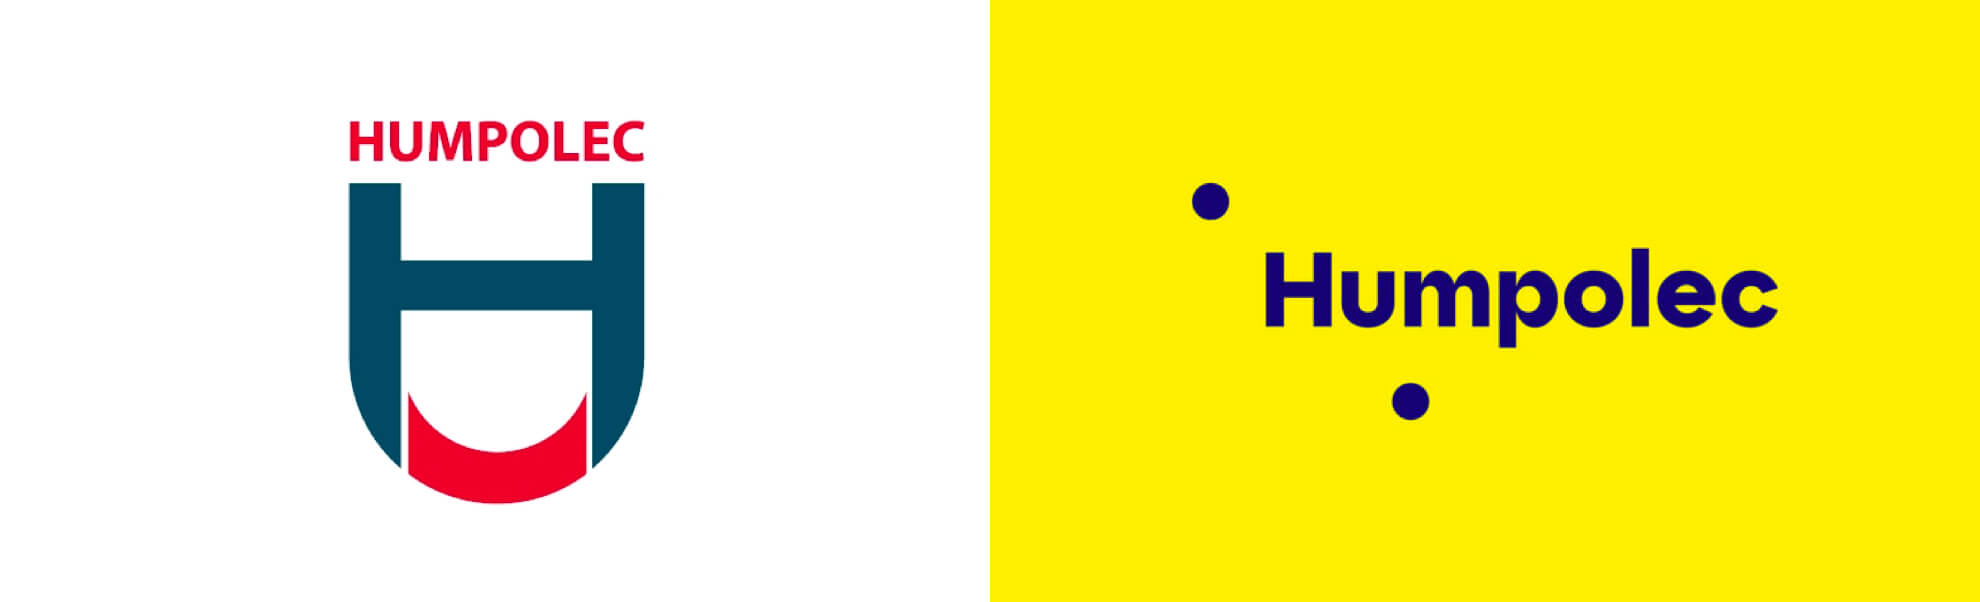 Stare inowe logo Humpolca